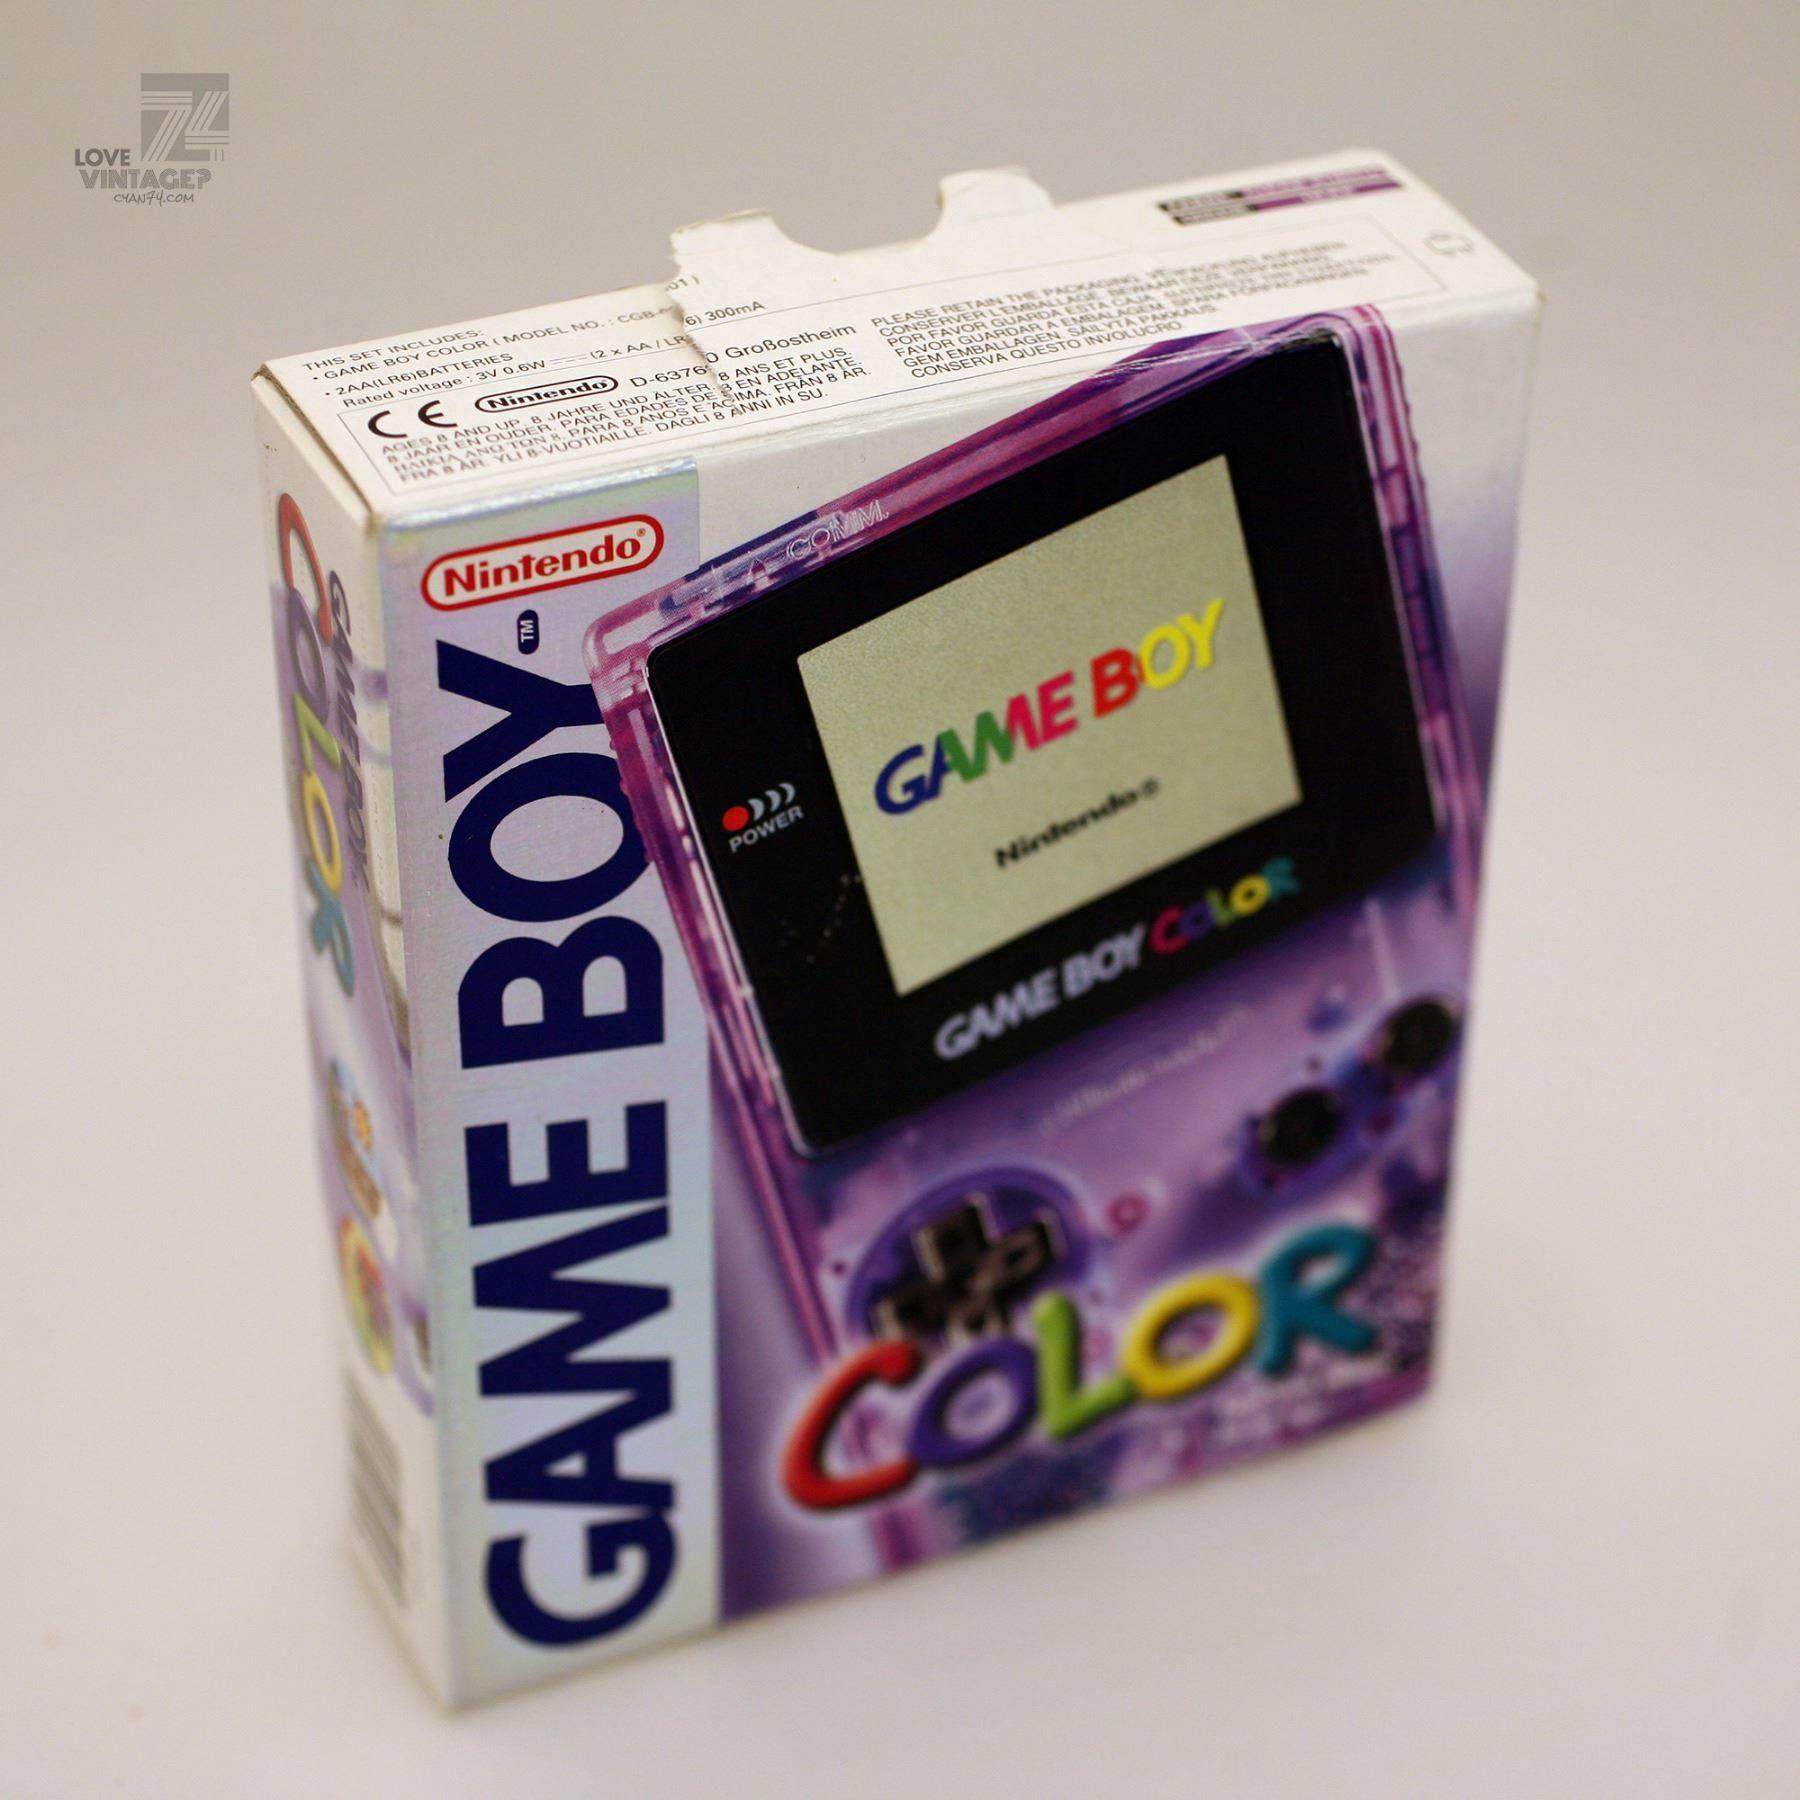 Game boy color kaufen - Nintendo Gameboy Color Konsole Ovp Cyan74 Com Vintage Pop Culture